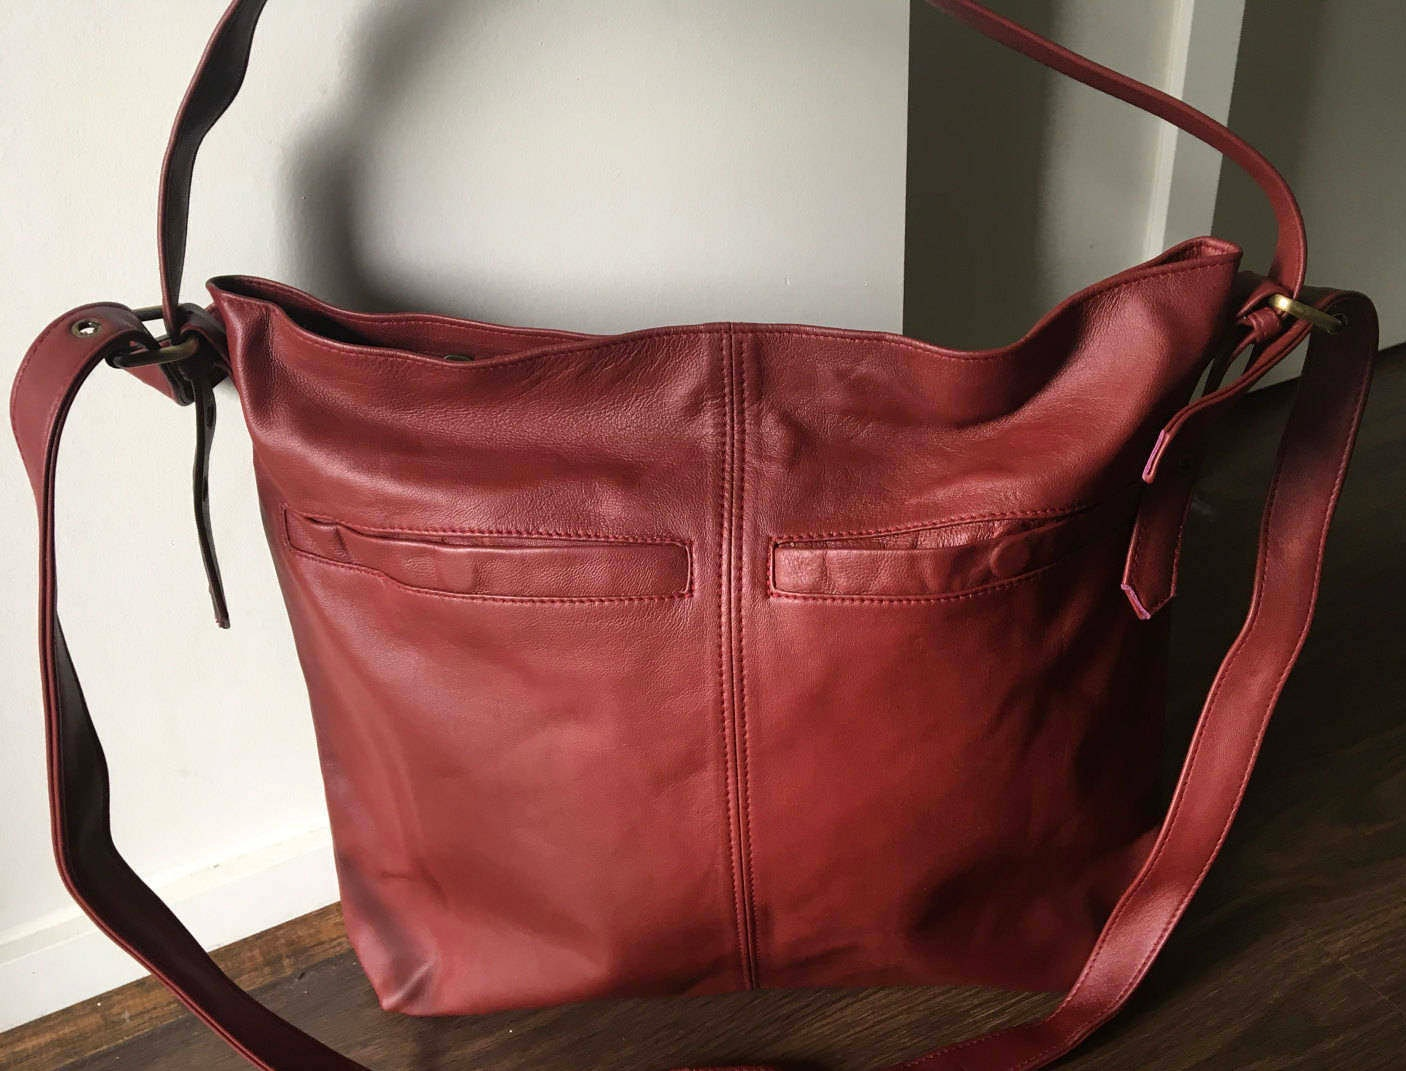 534882691f Leather shoulder Tote Bag.Stylish with adjustable strap with belt ...